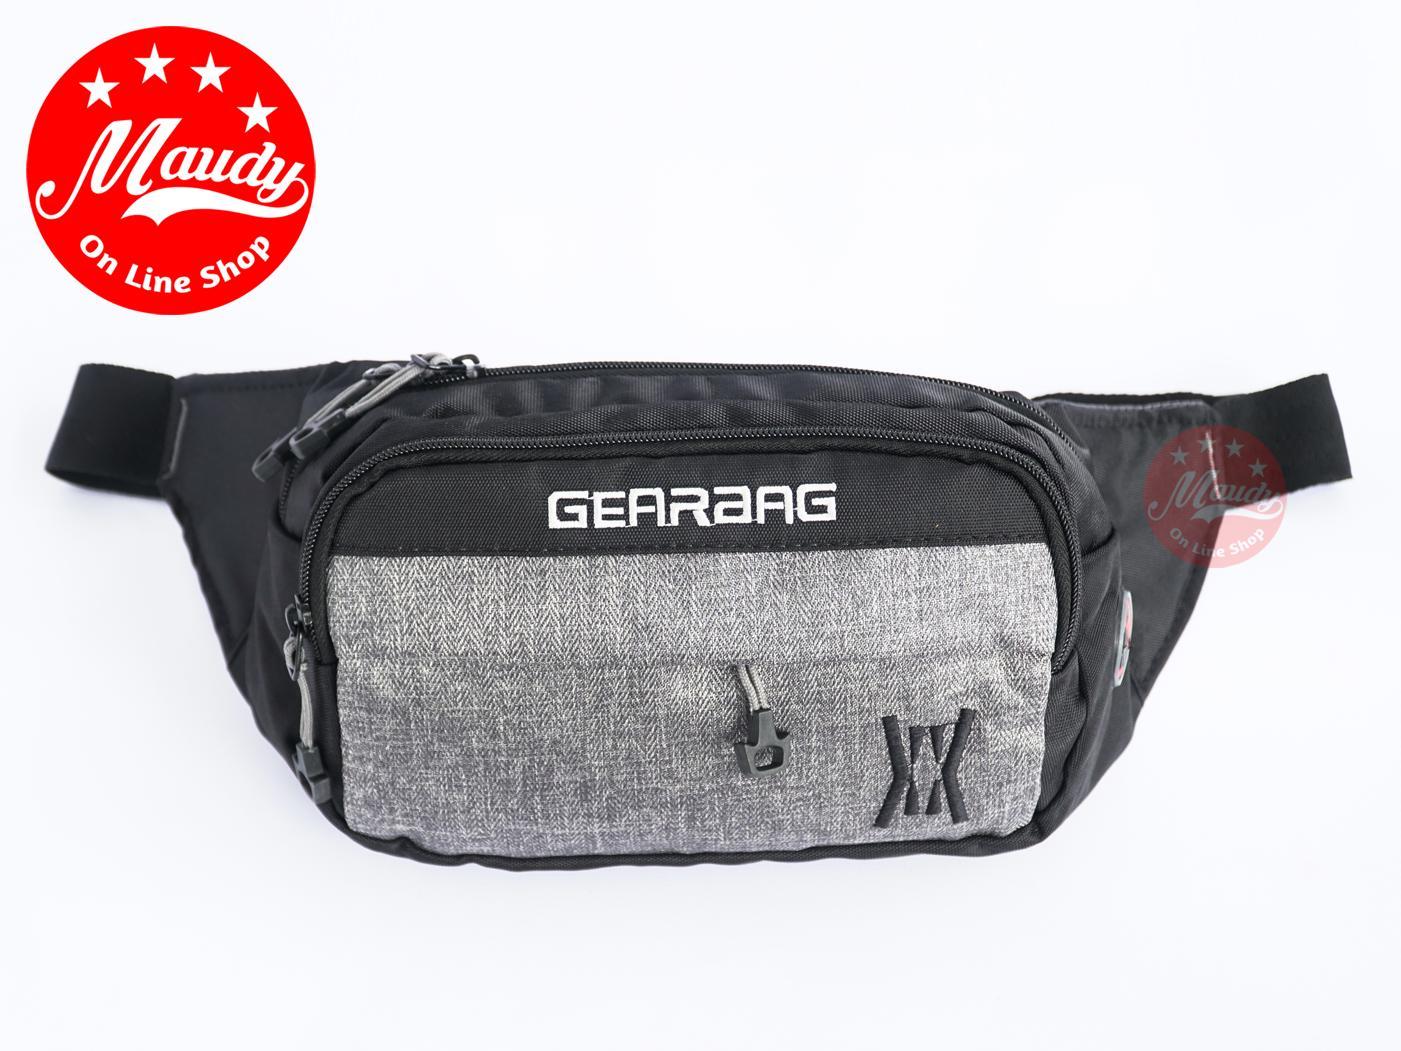 waist bag gear bag urban 93 – sling bag cowok – waist bag laki laki – tas selempang – tas pinggang